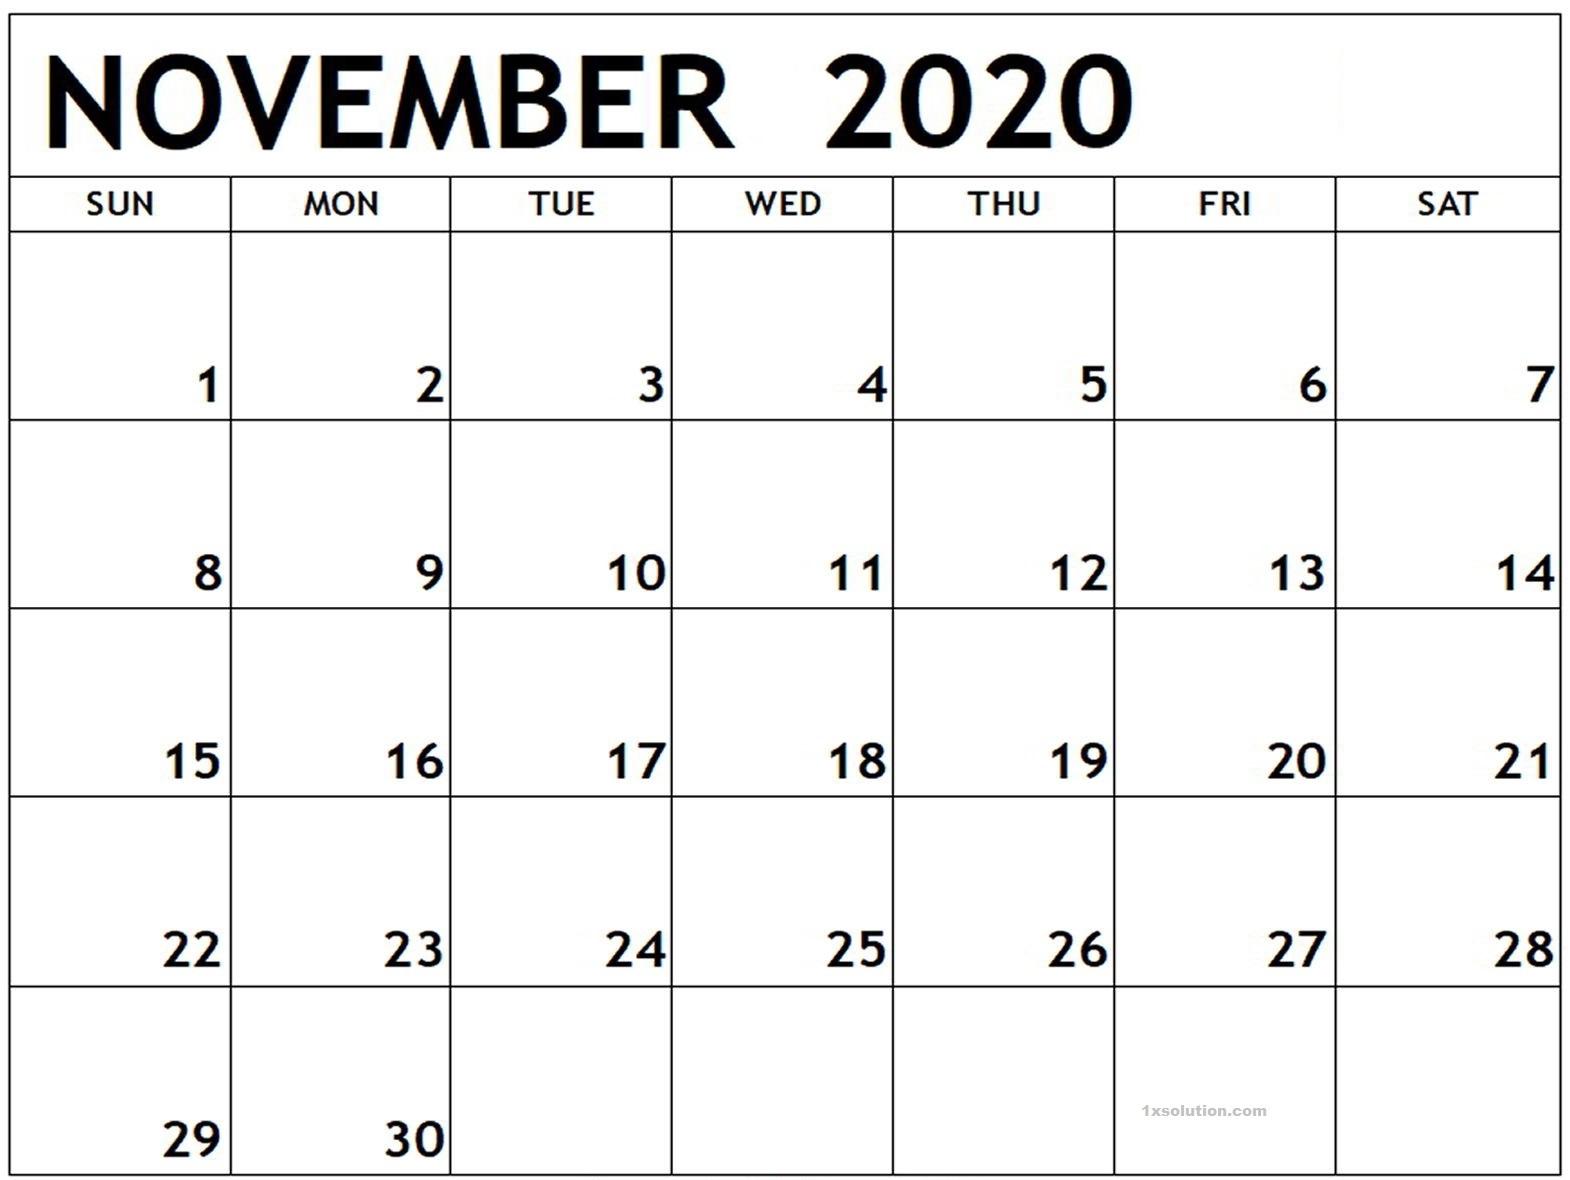 November 2020 Calendar Printable Landscape